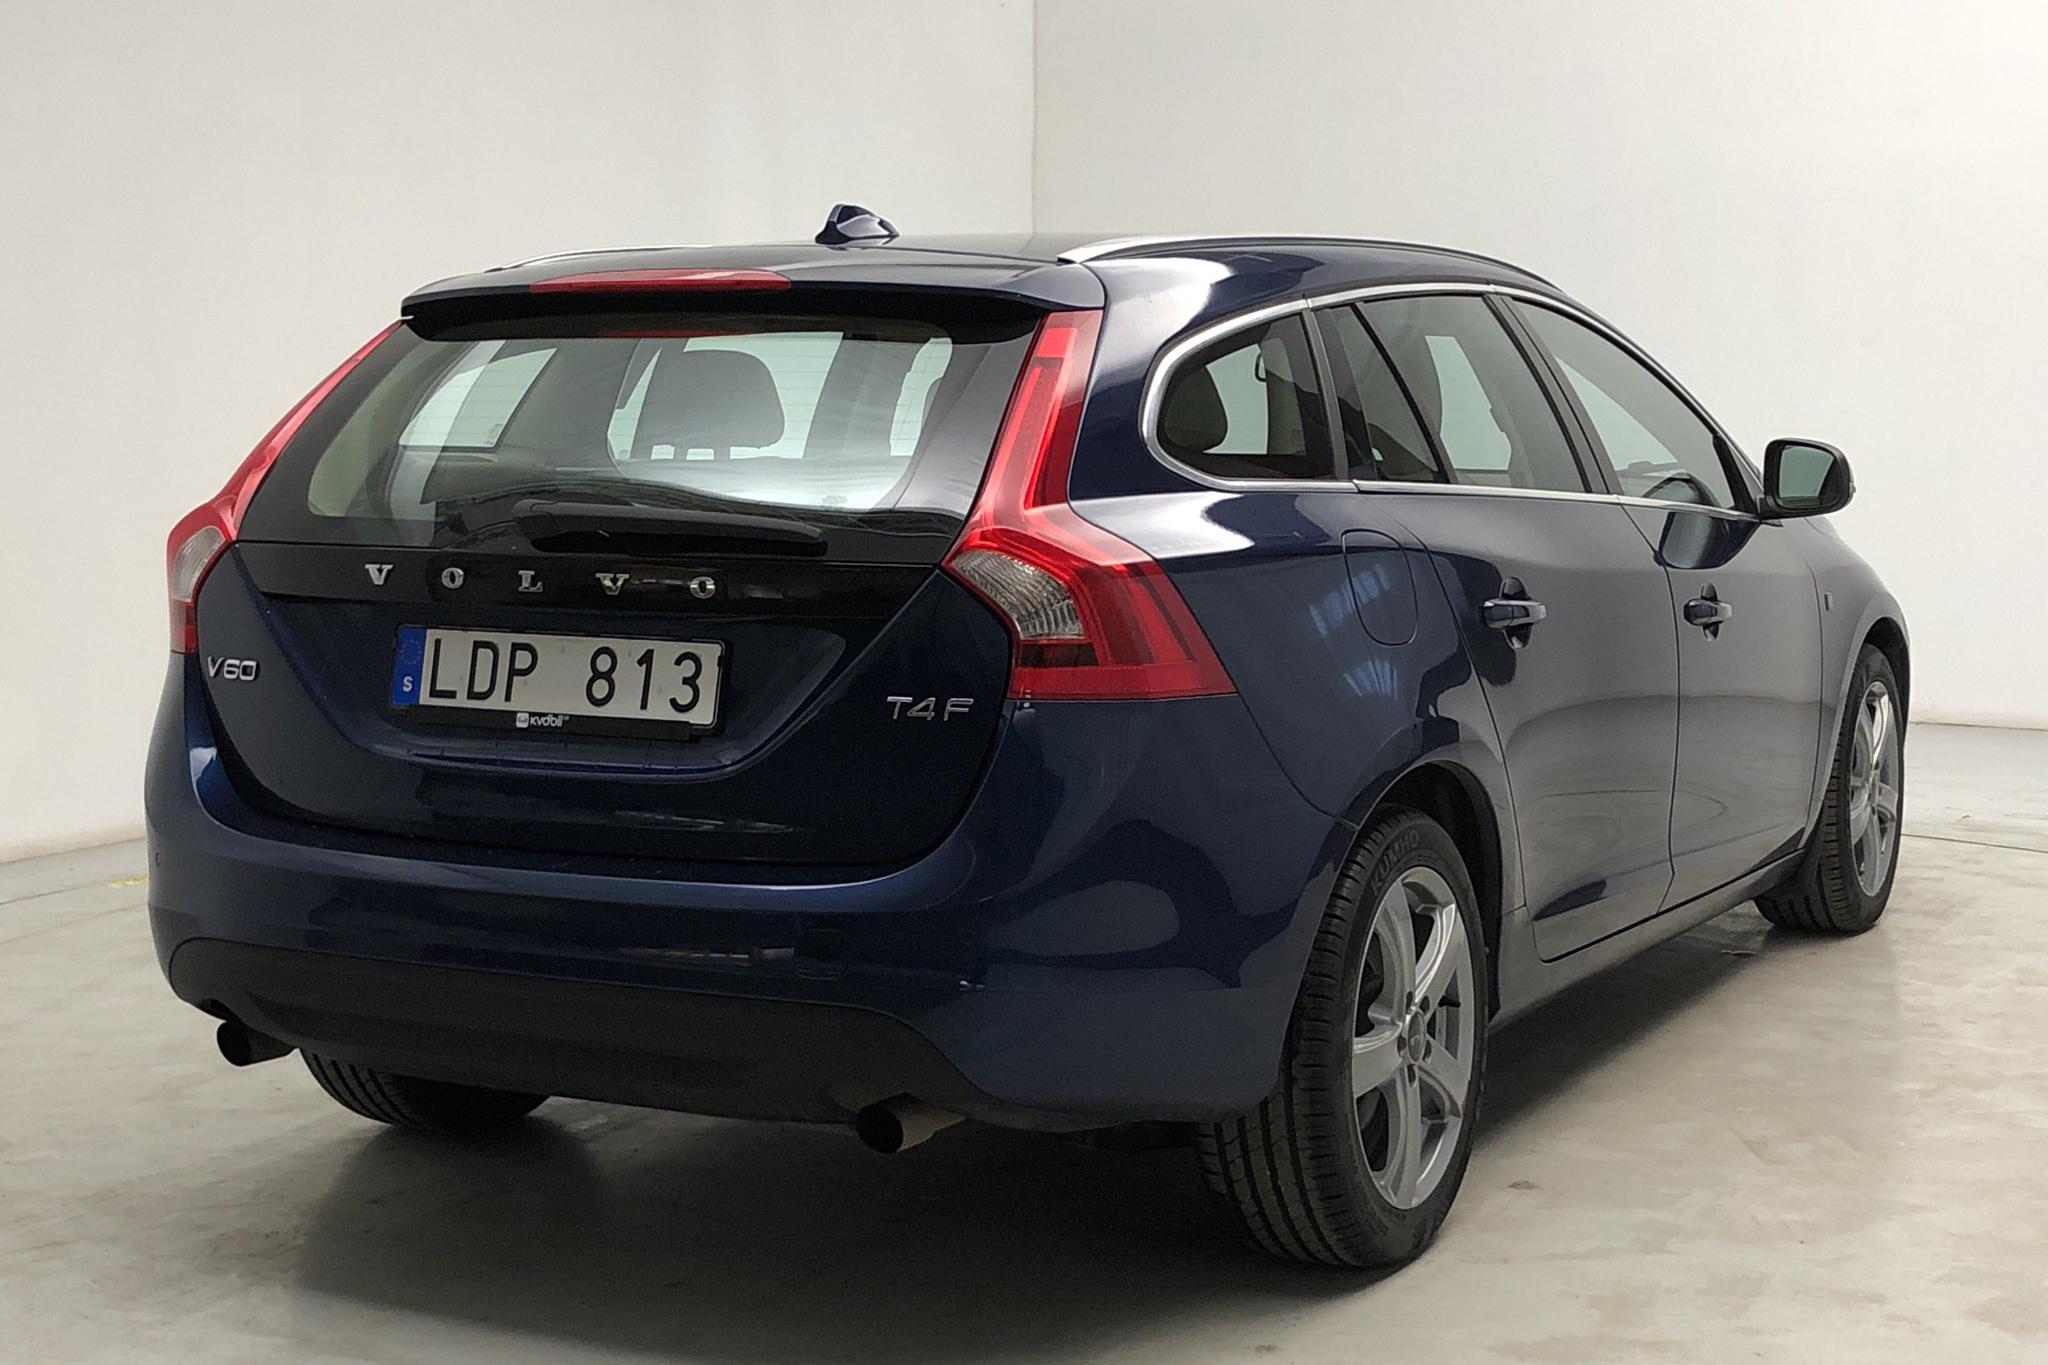 Volvo V60 T4F (180hk) - 91 440 km - Automatic - blue - 2012